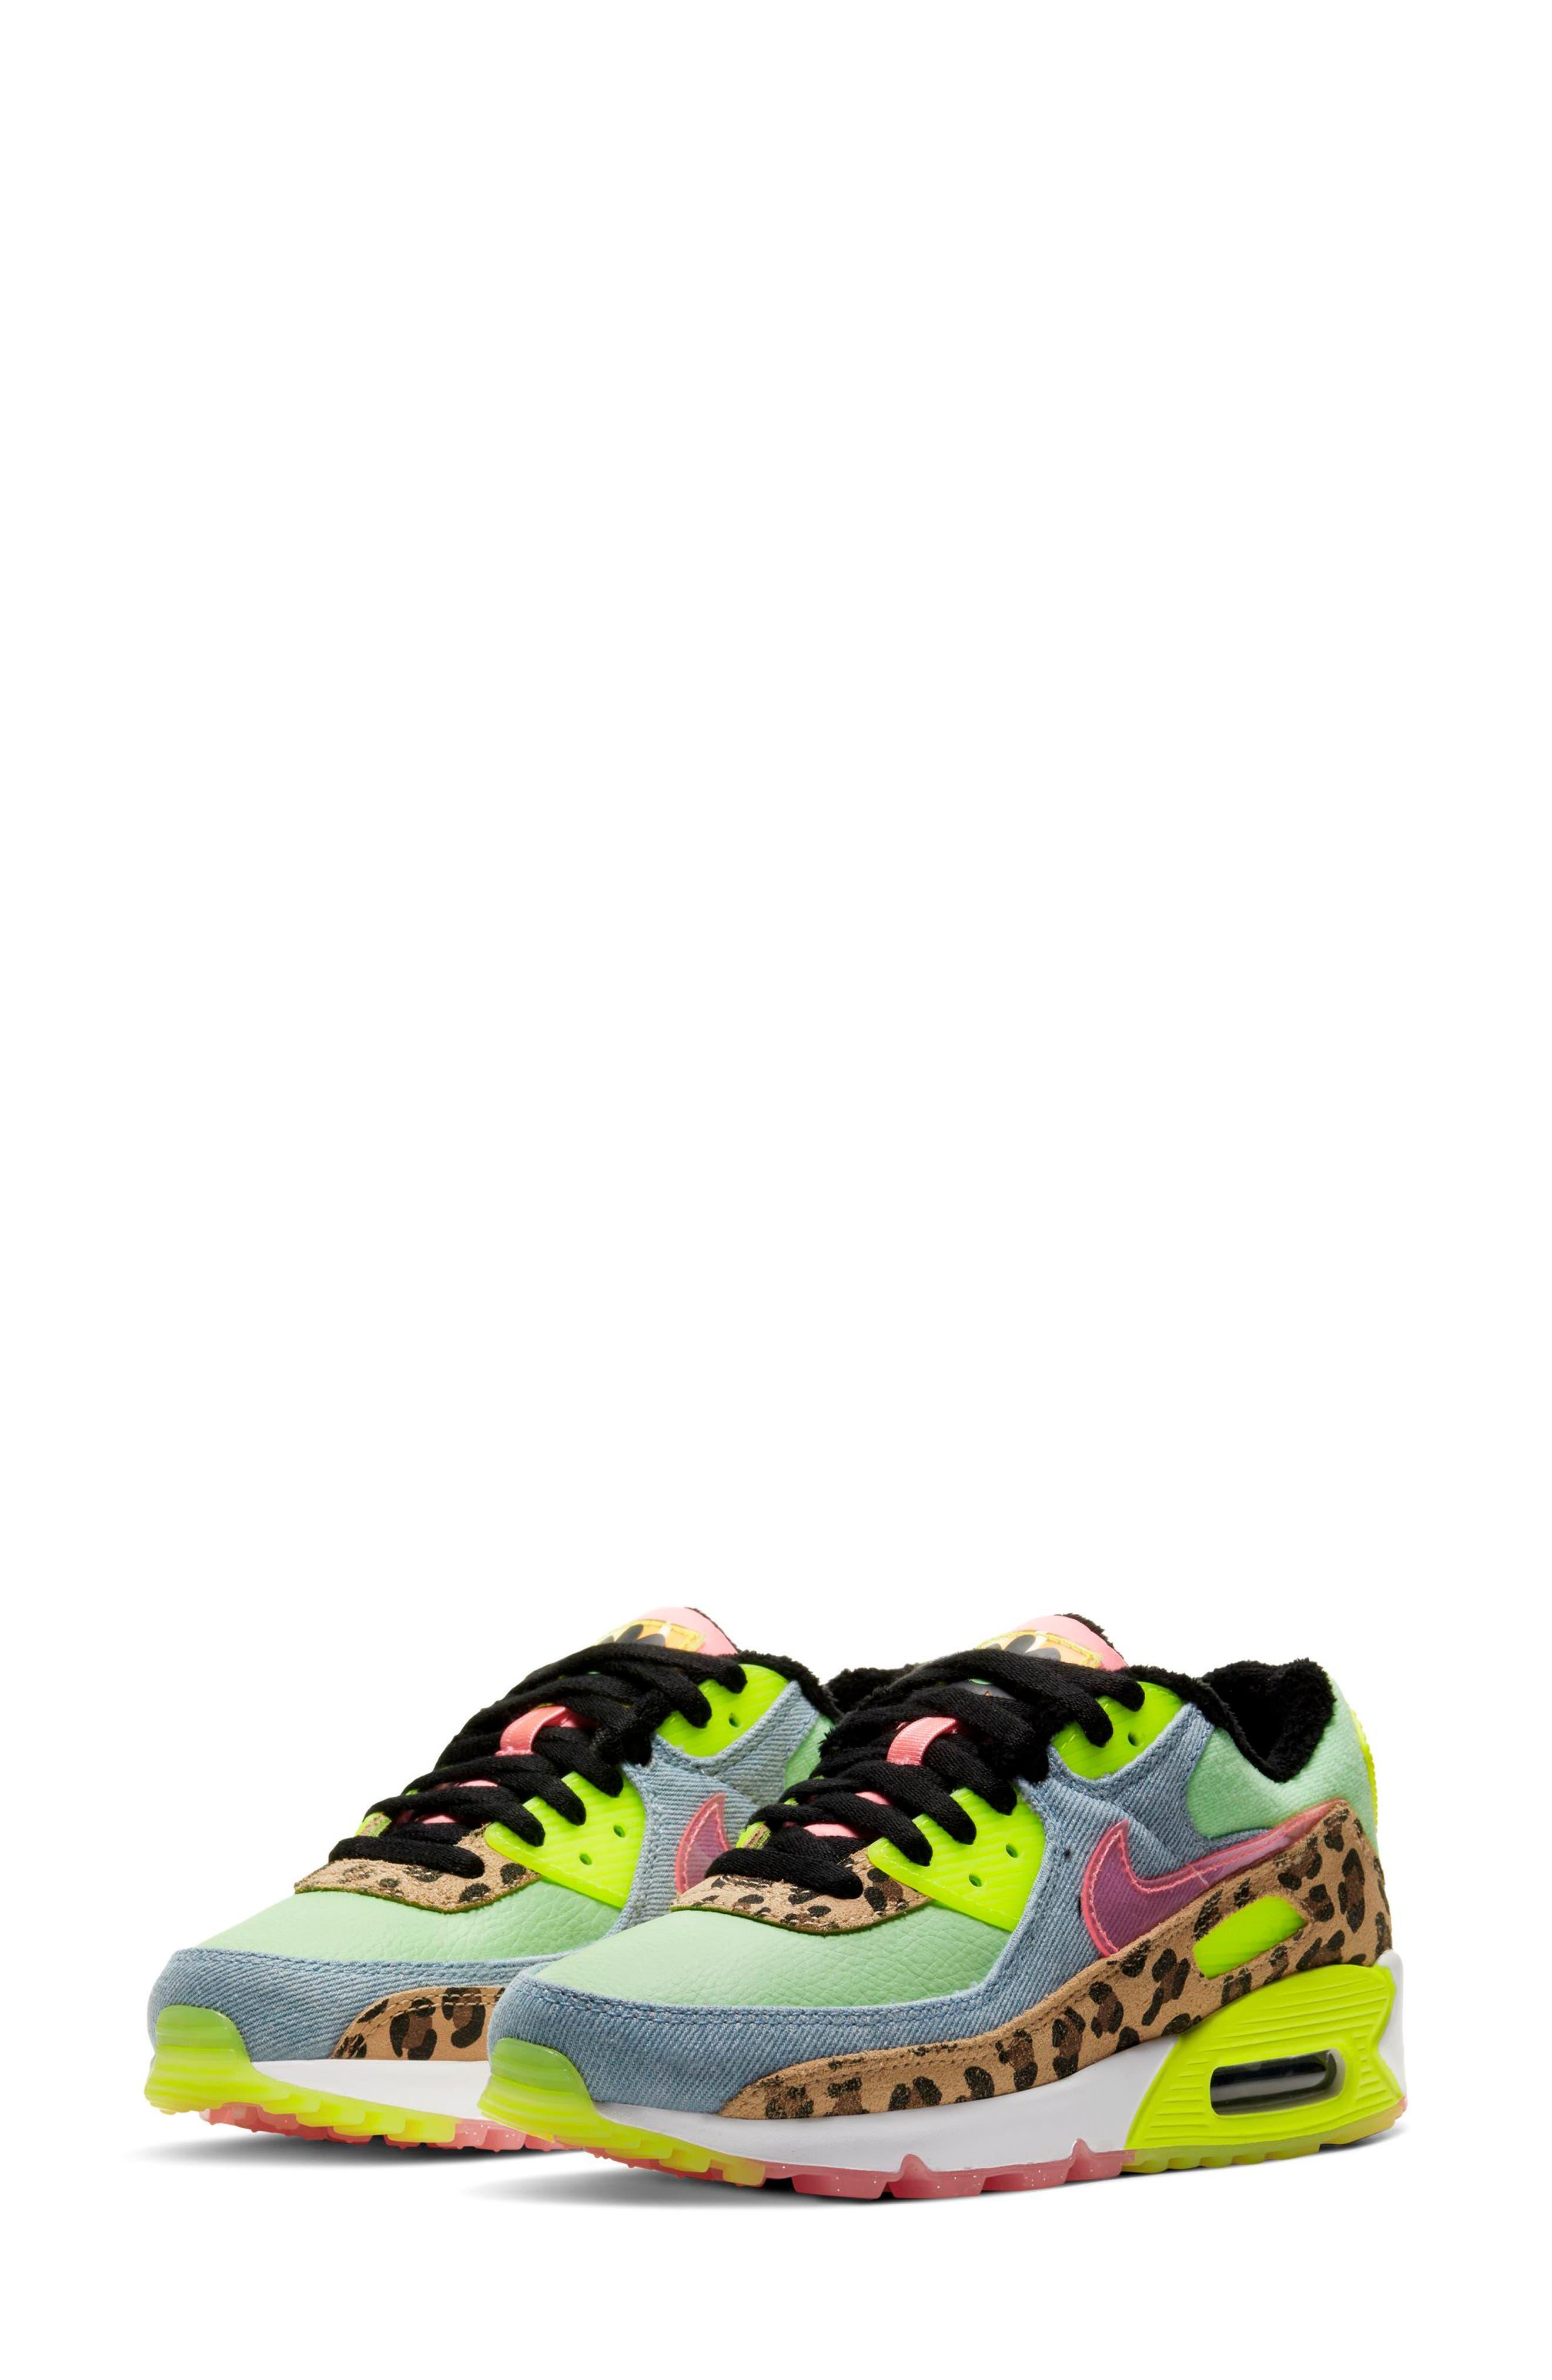 Nike Air Max 90 LX Sneaker (Women